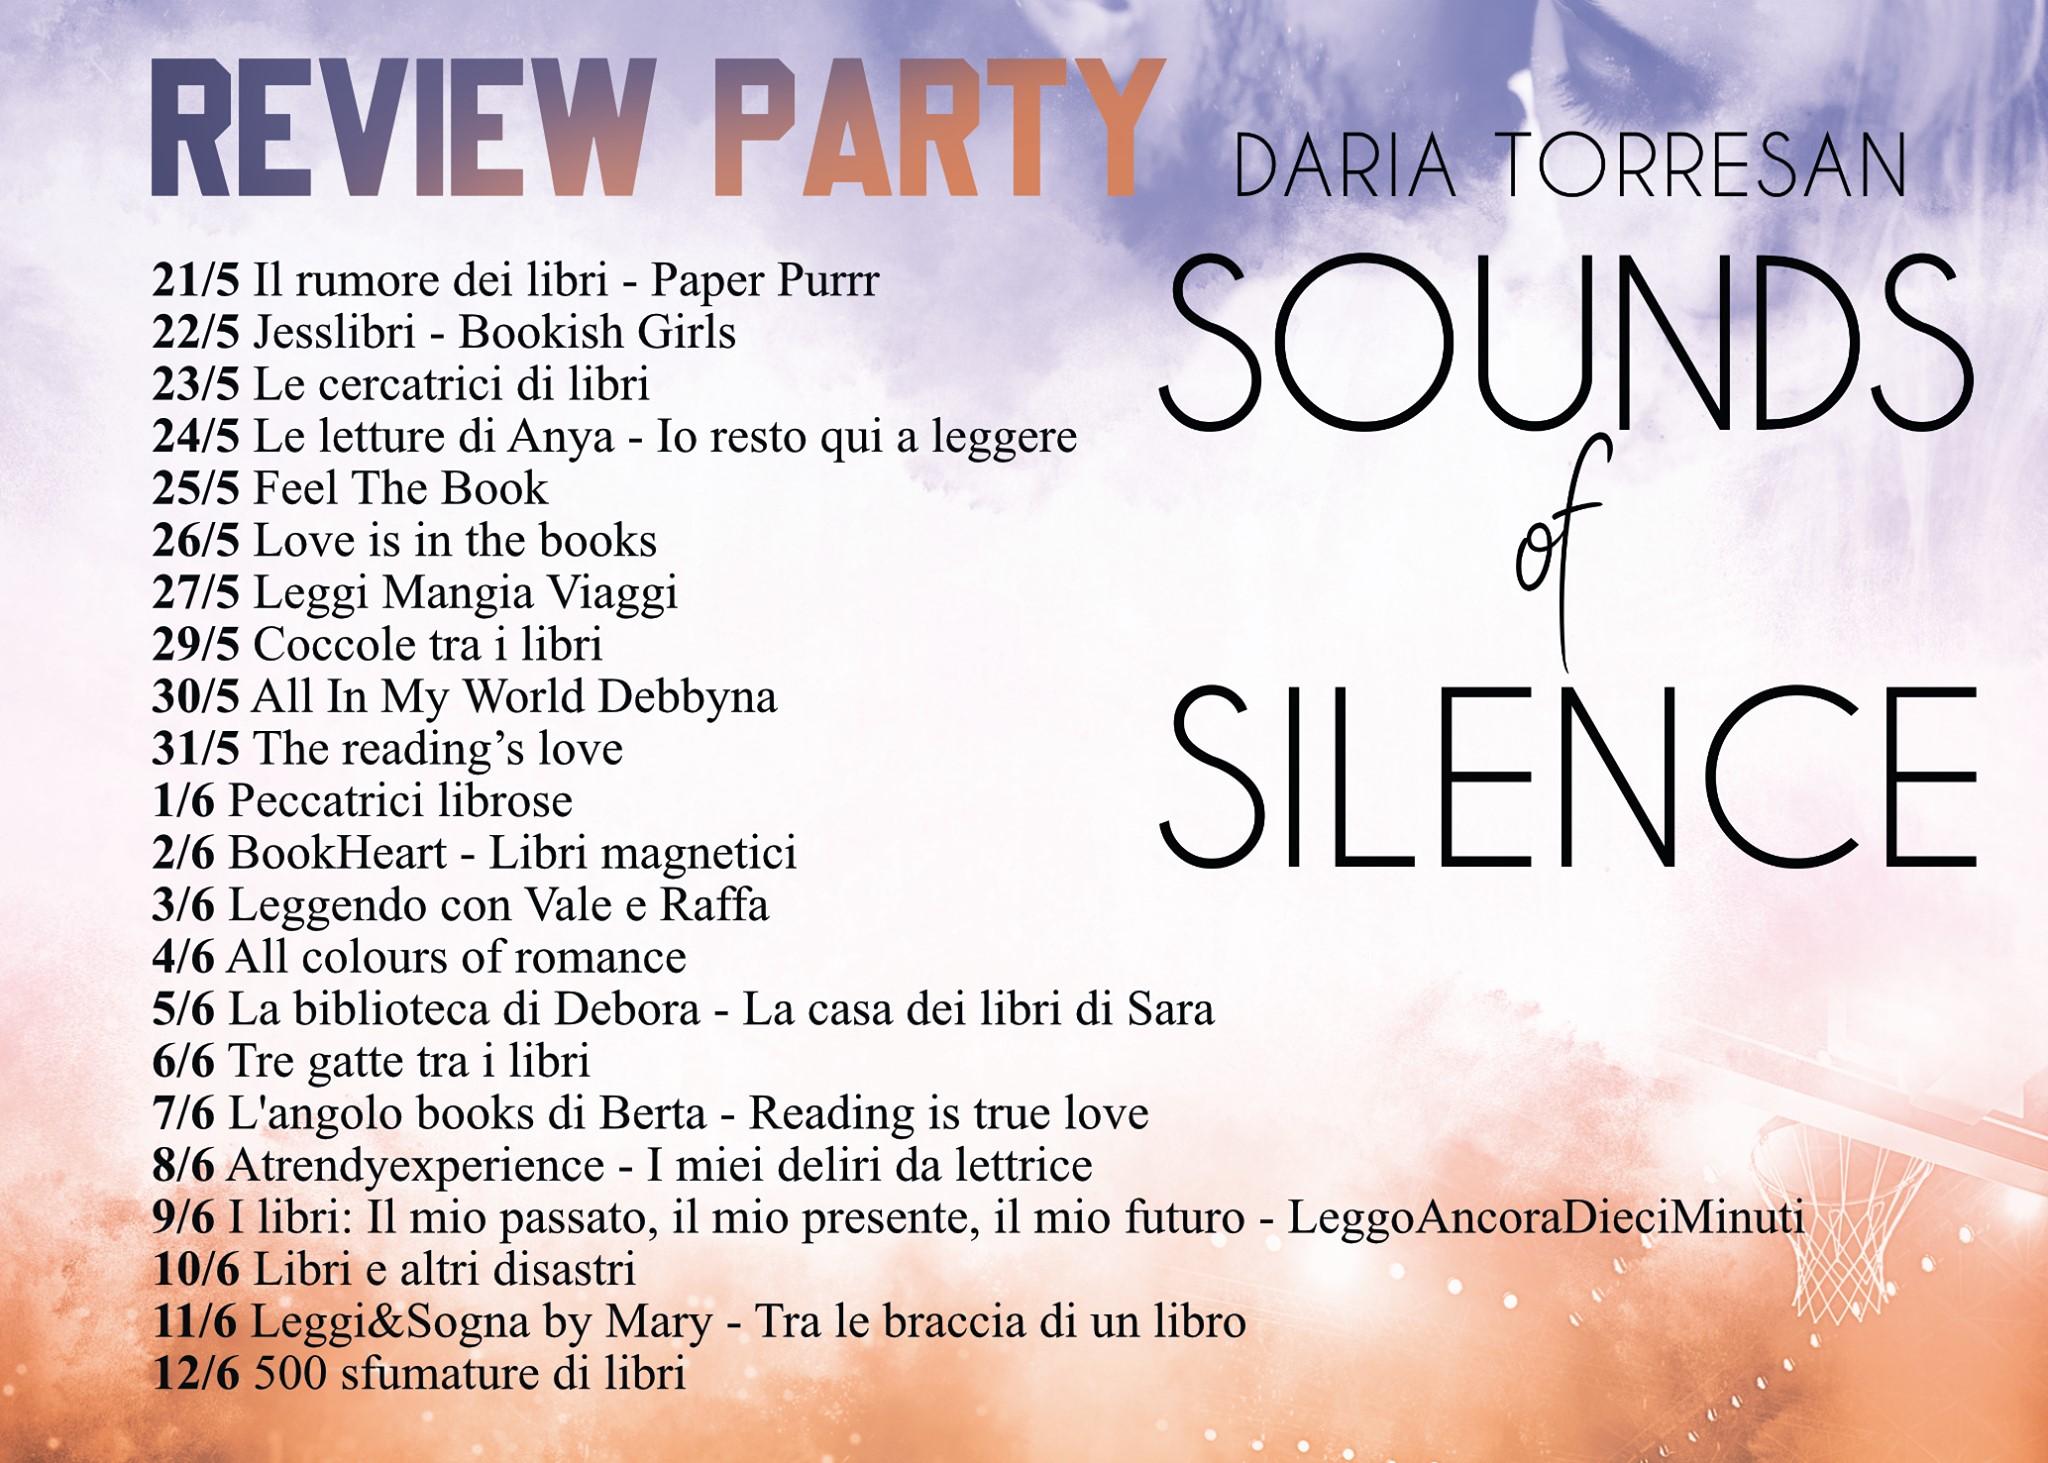 sounds of silence di daria torresan review party